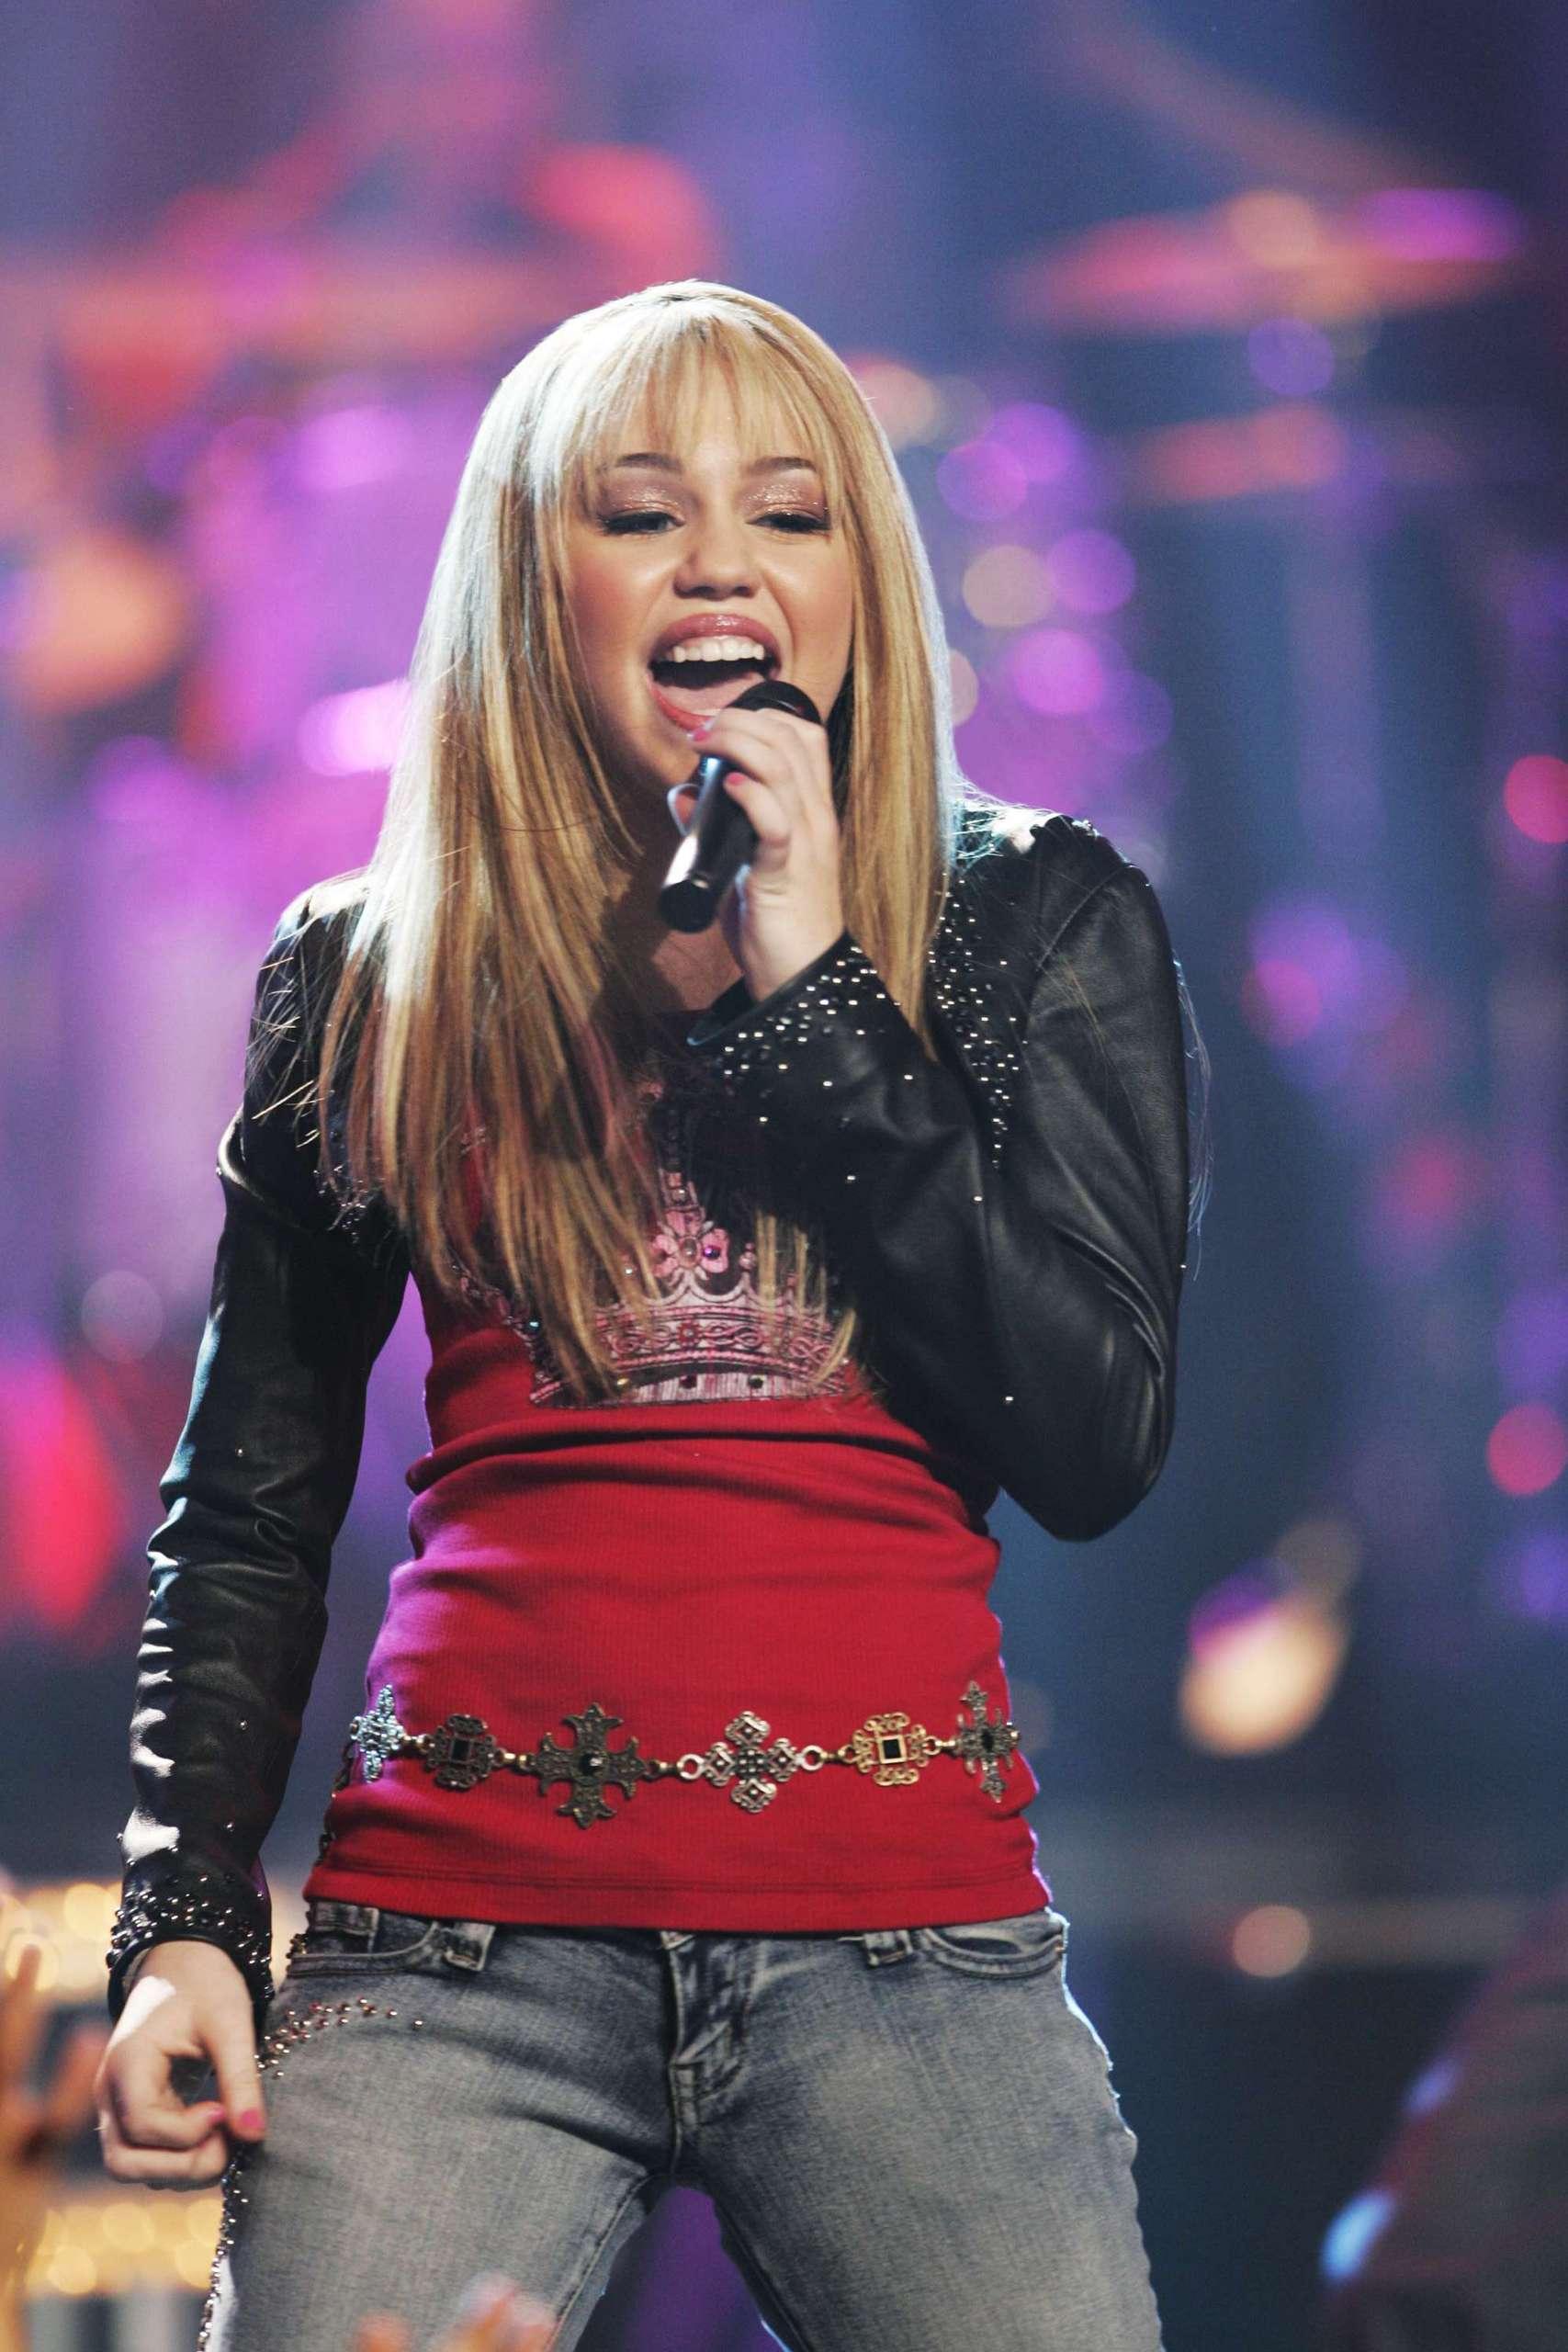 Miley Get Your Gum